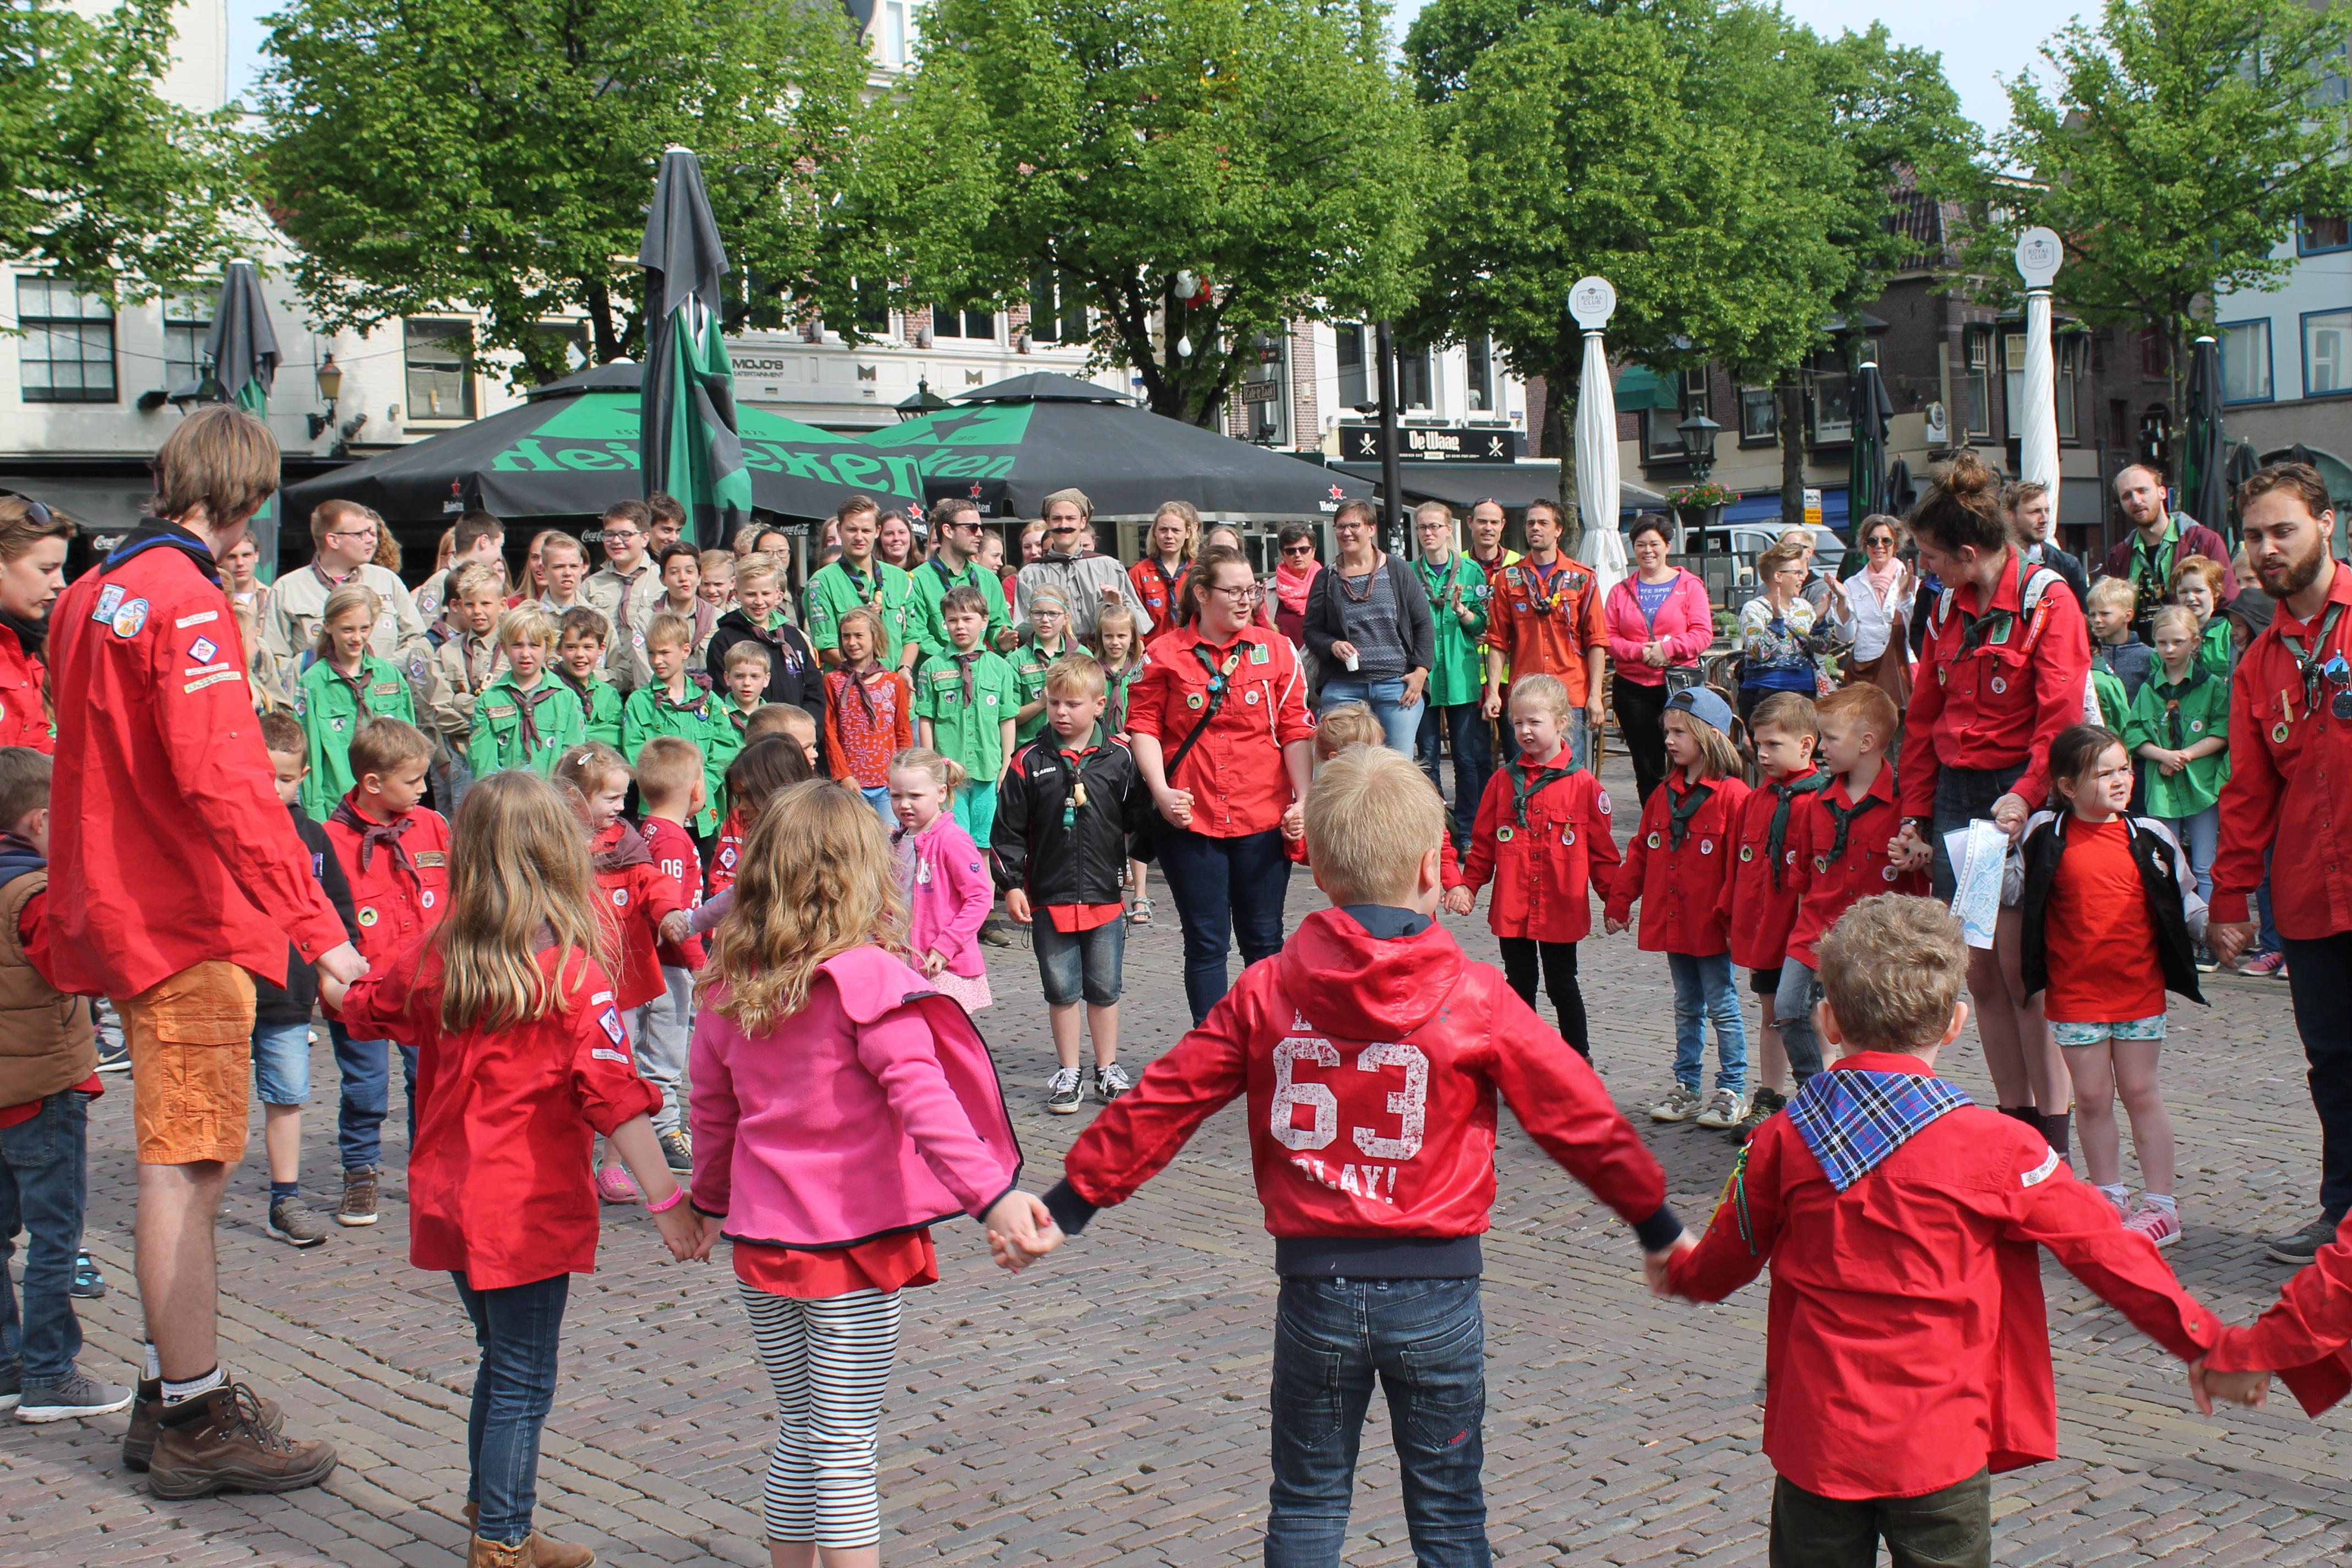 Scouting Alkmaar viert honderdjarig bestaan. (Foto's: aangeleverd)